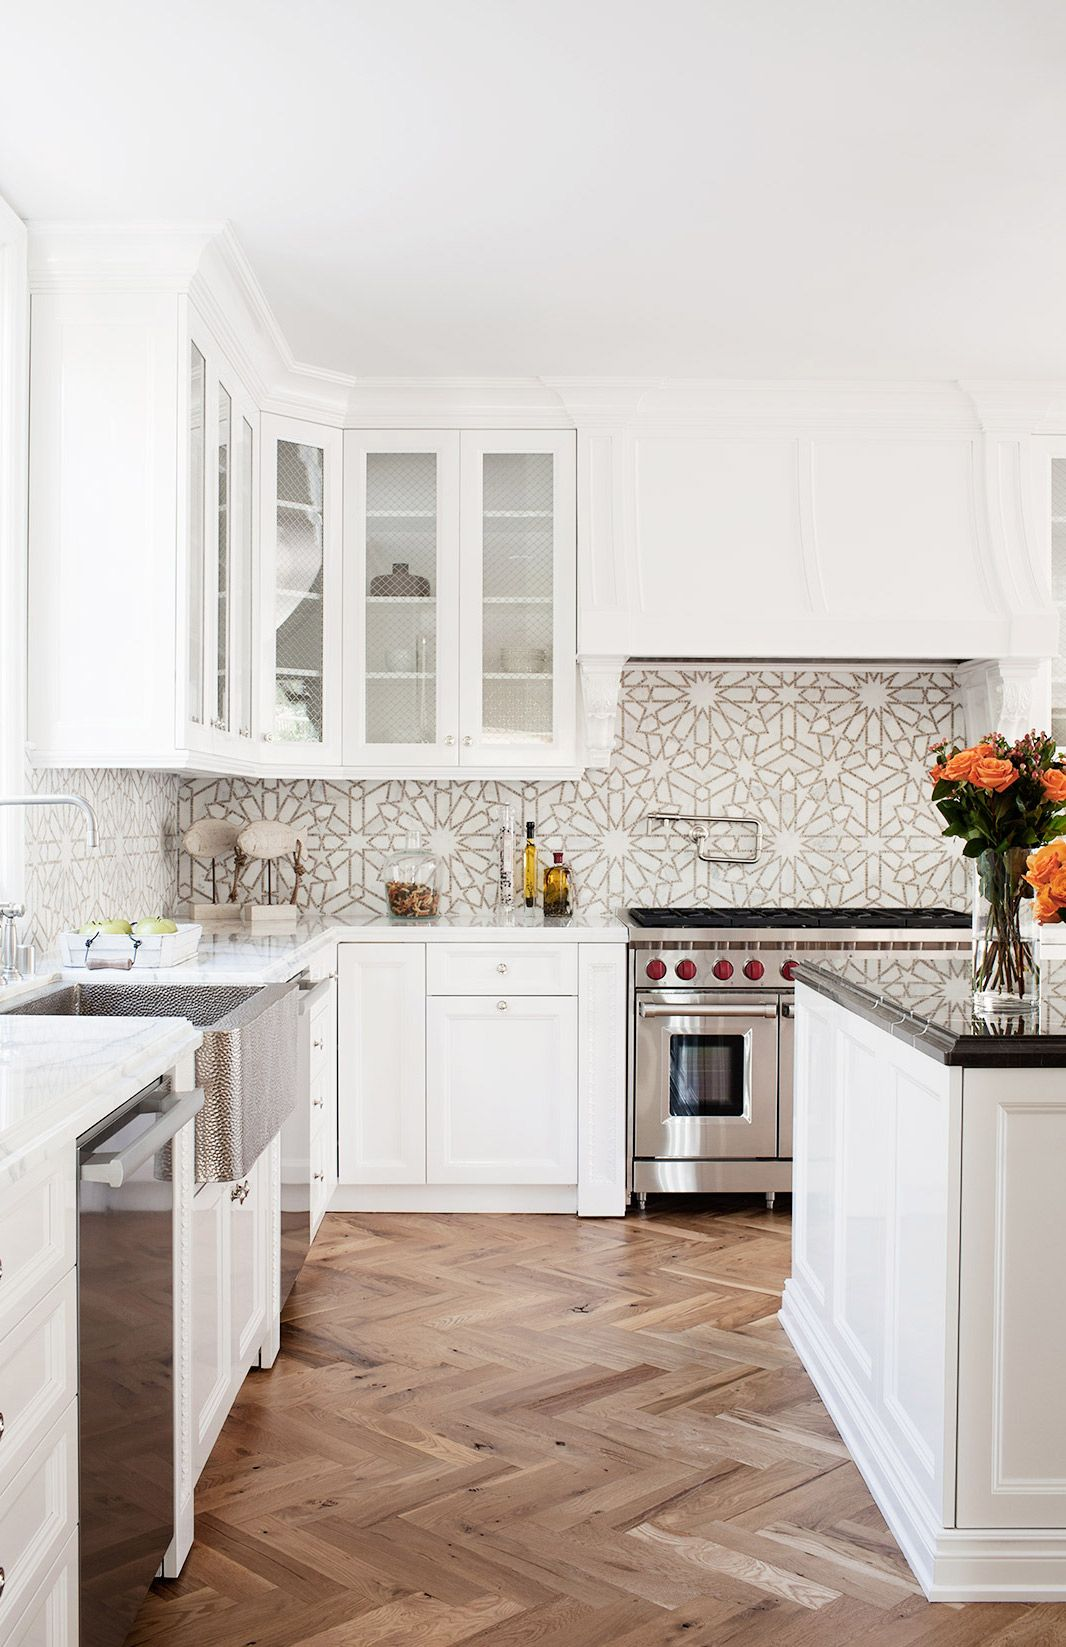 white tile backsplash kitchen granite countertops 18 unique design ideas style motivation